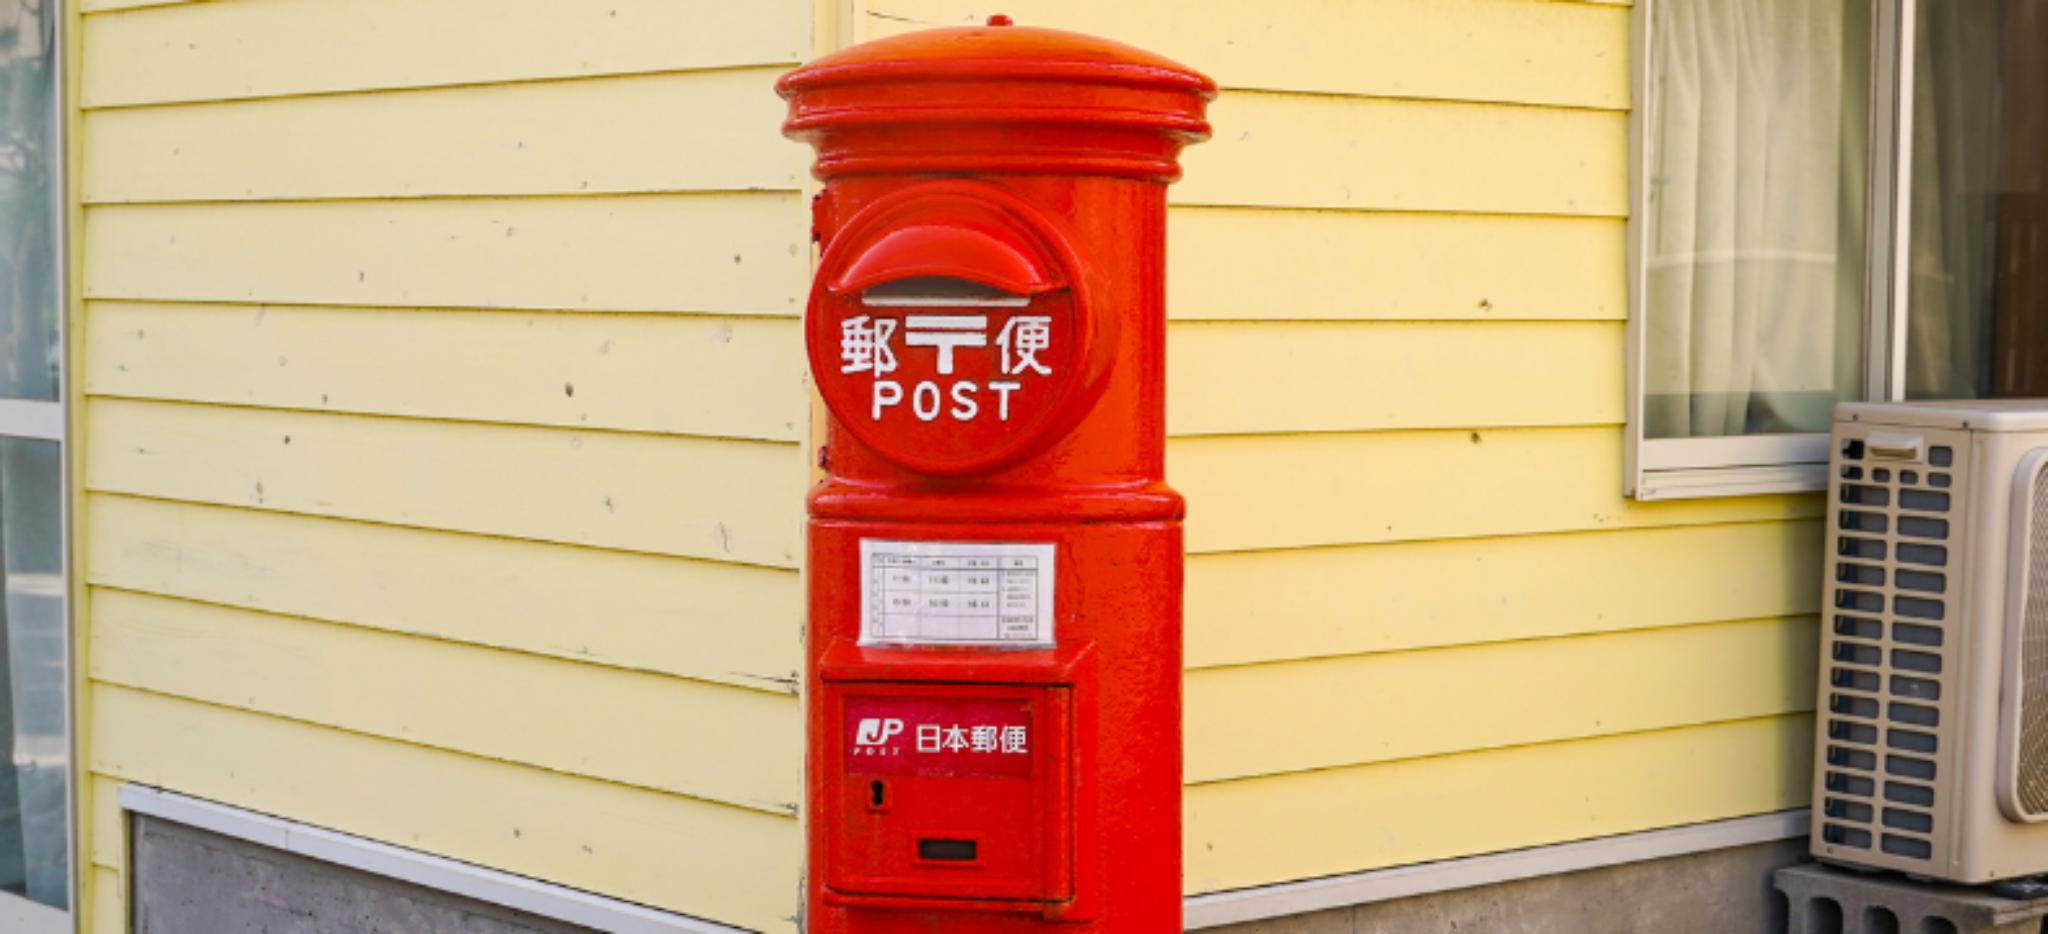 enviar un paquete a Japón